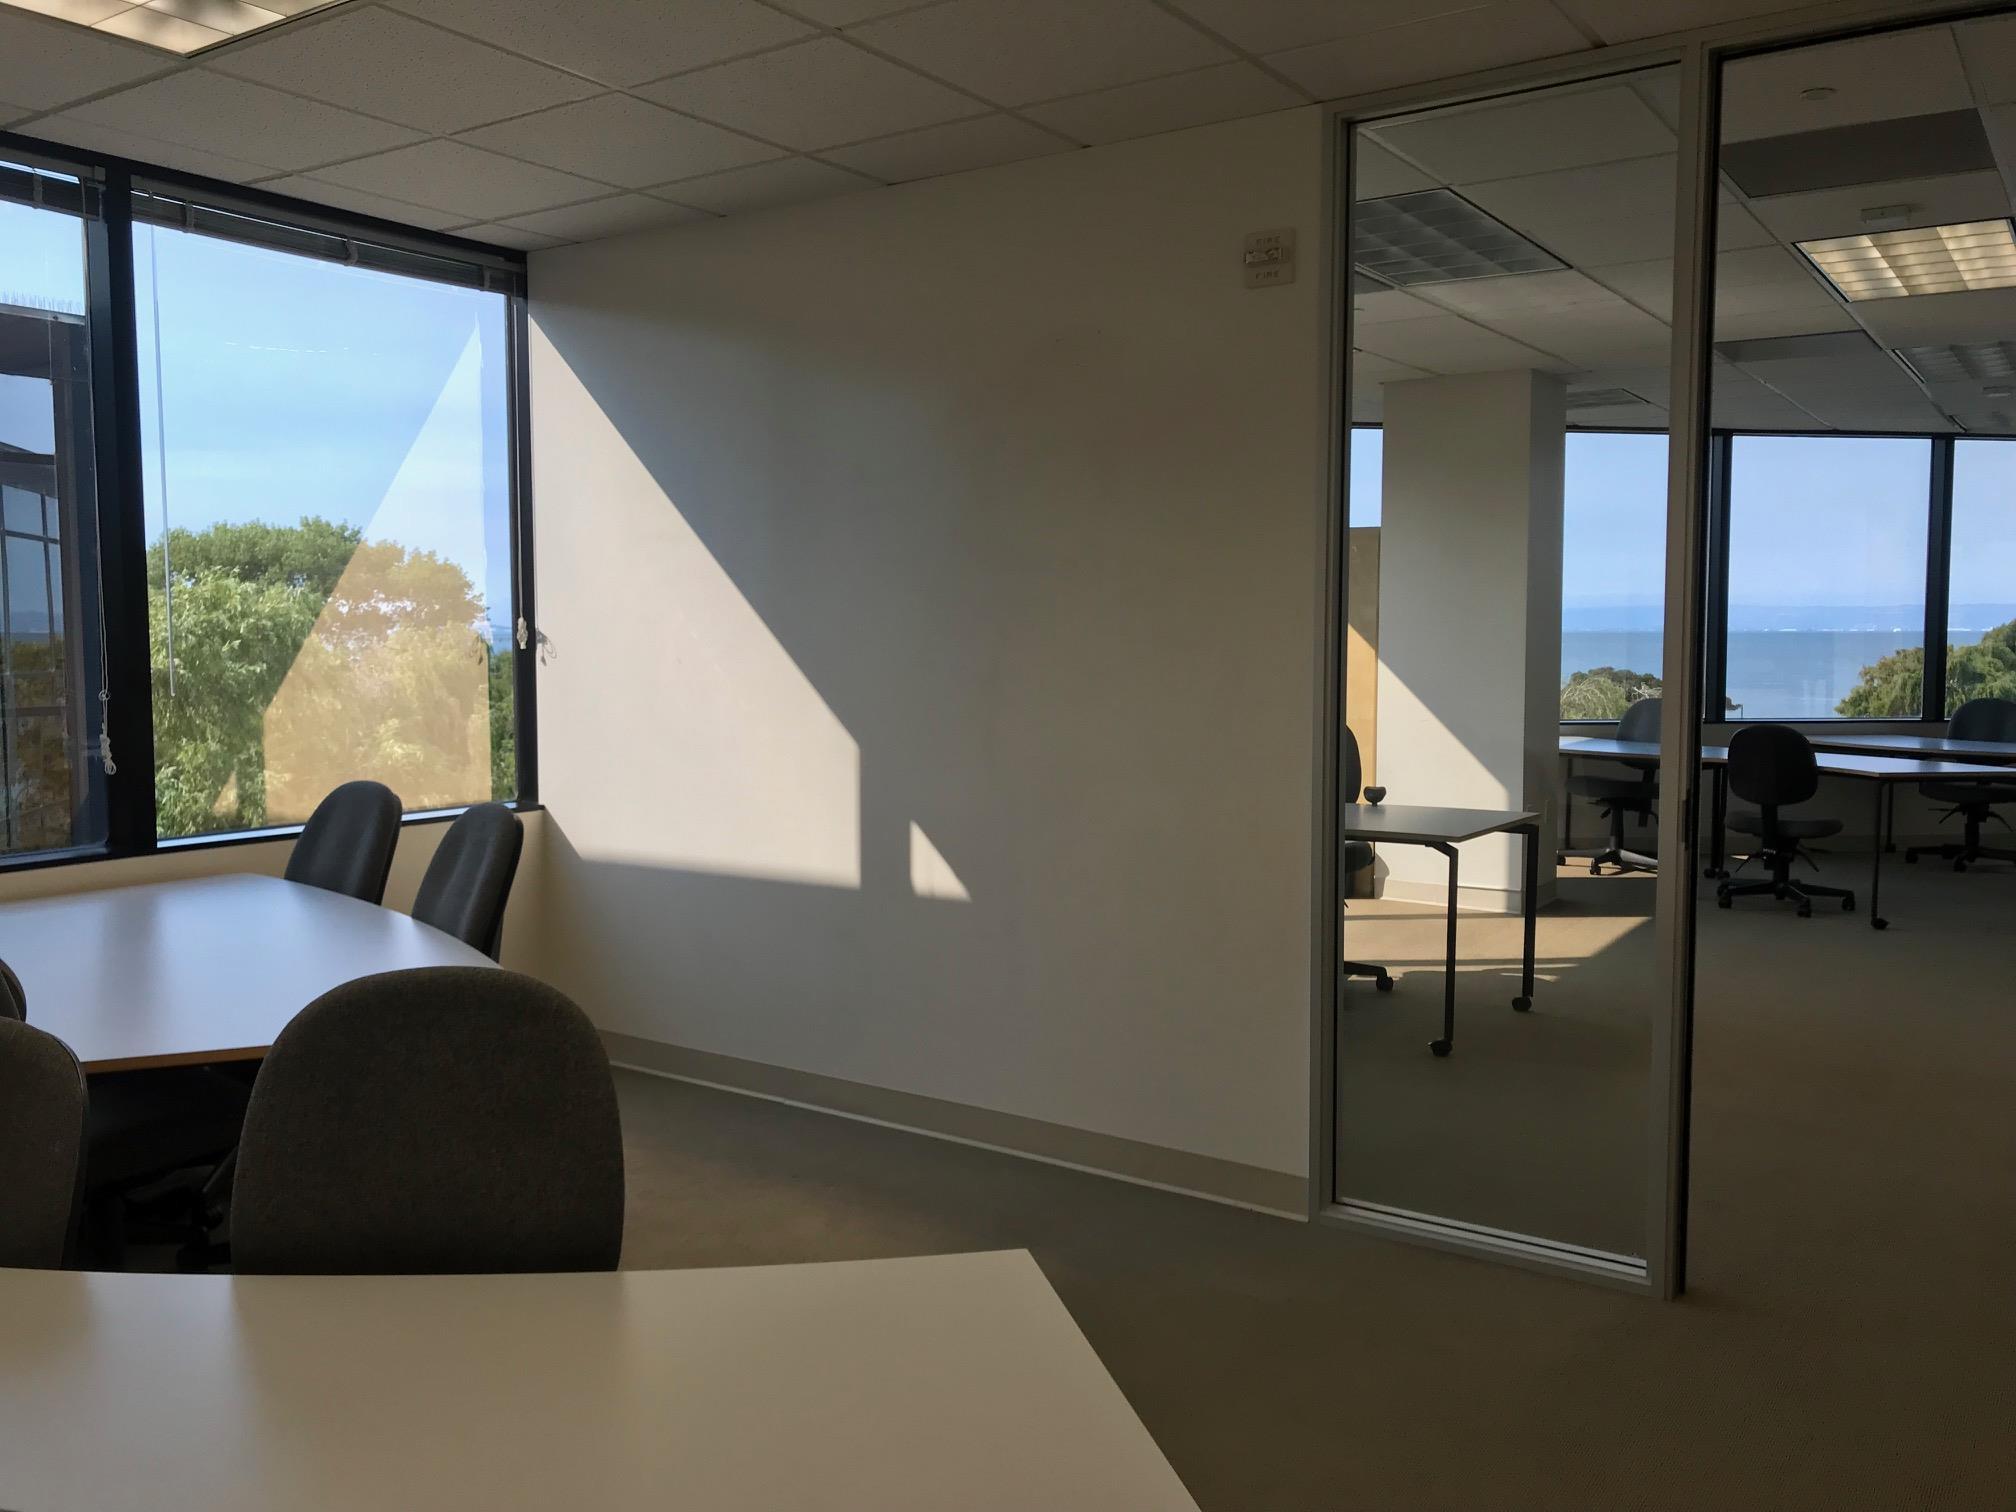 TUTORWORKS - Private office